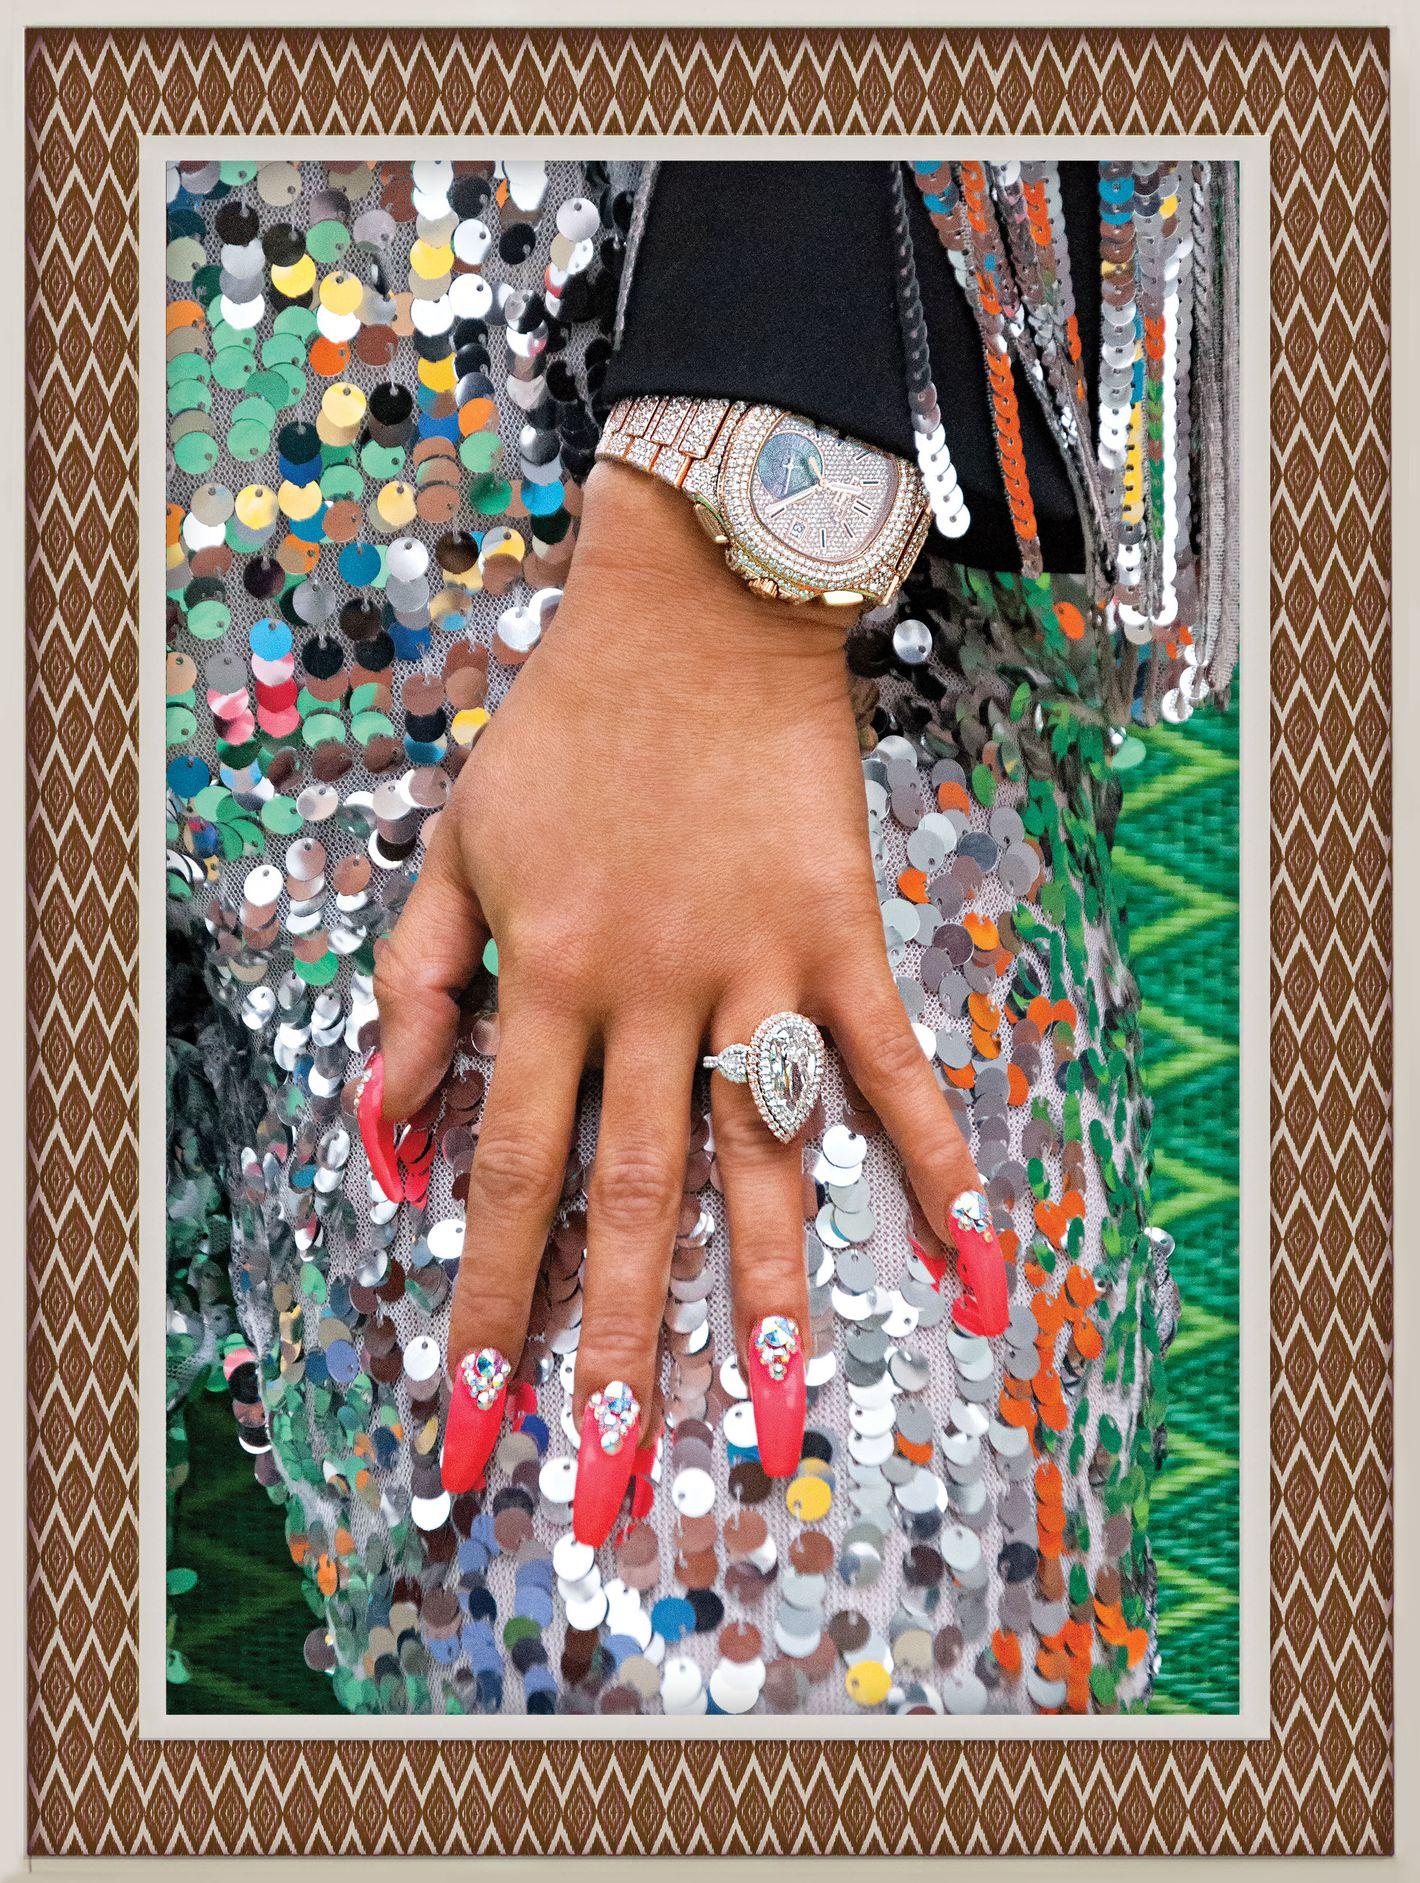 Cardi B: New York Magazine Profile